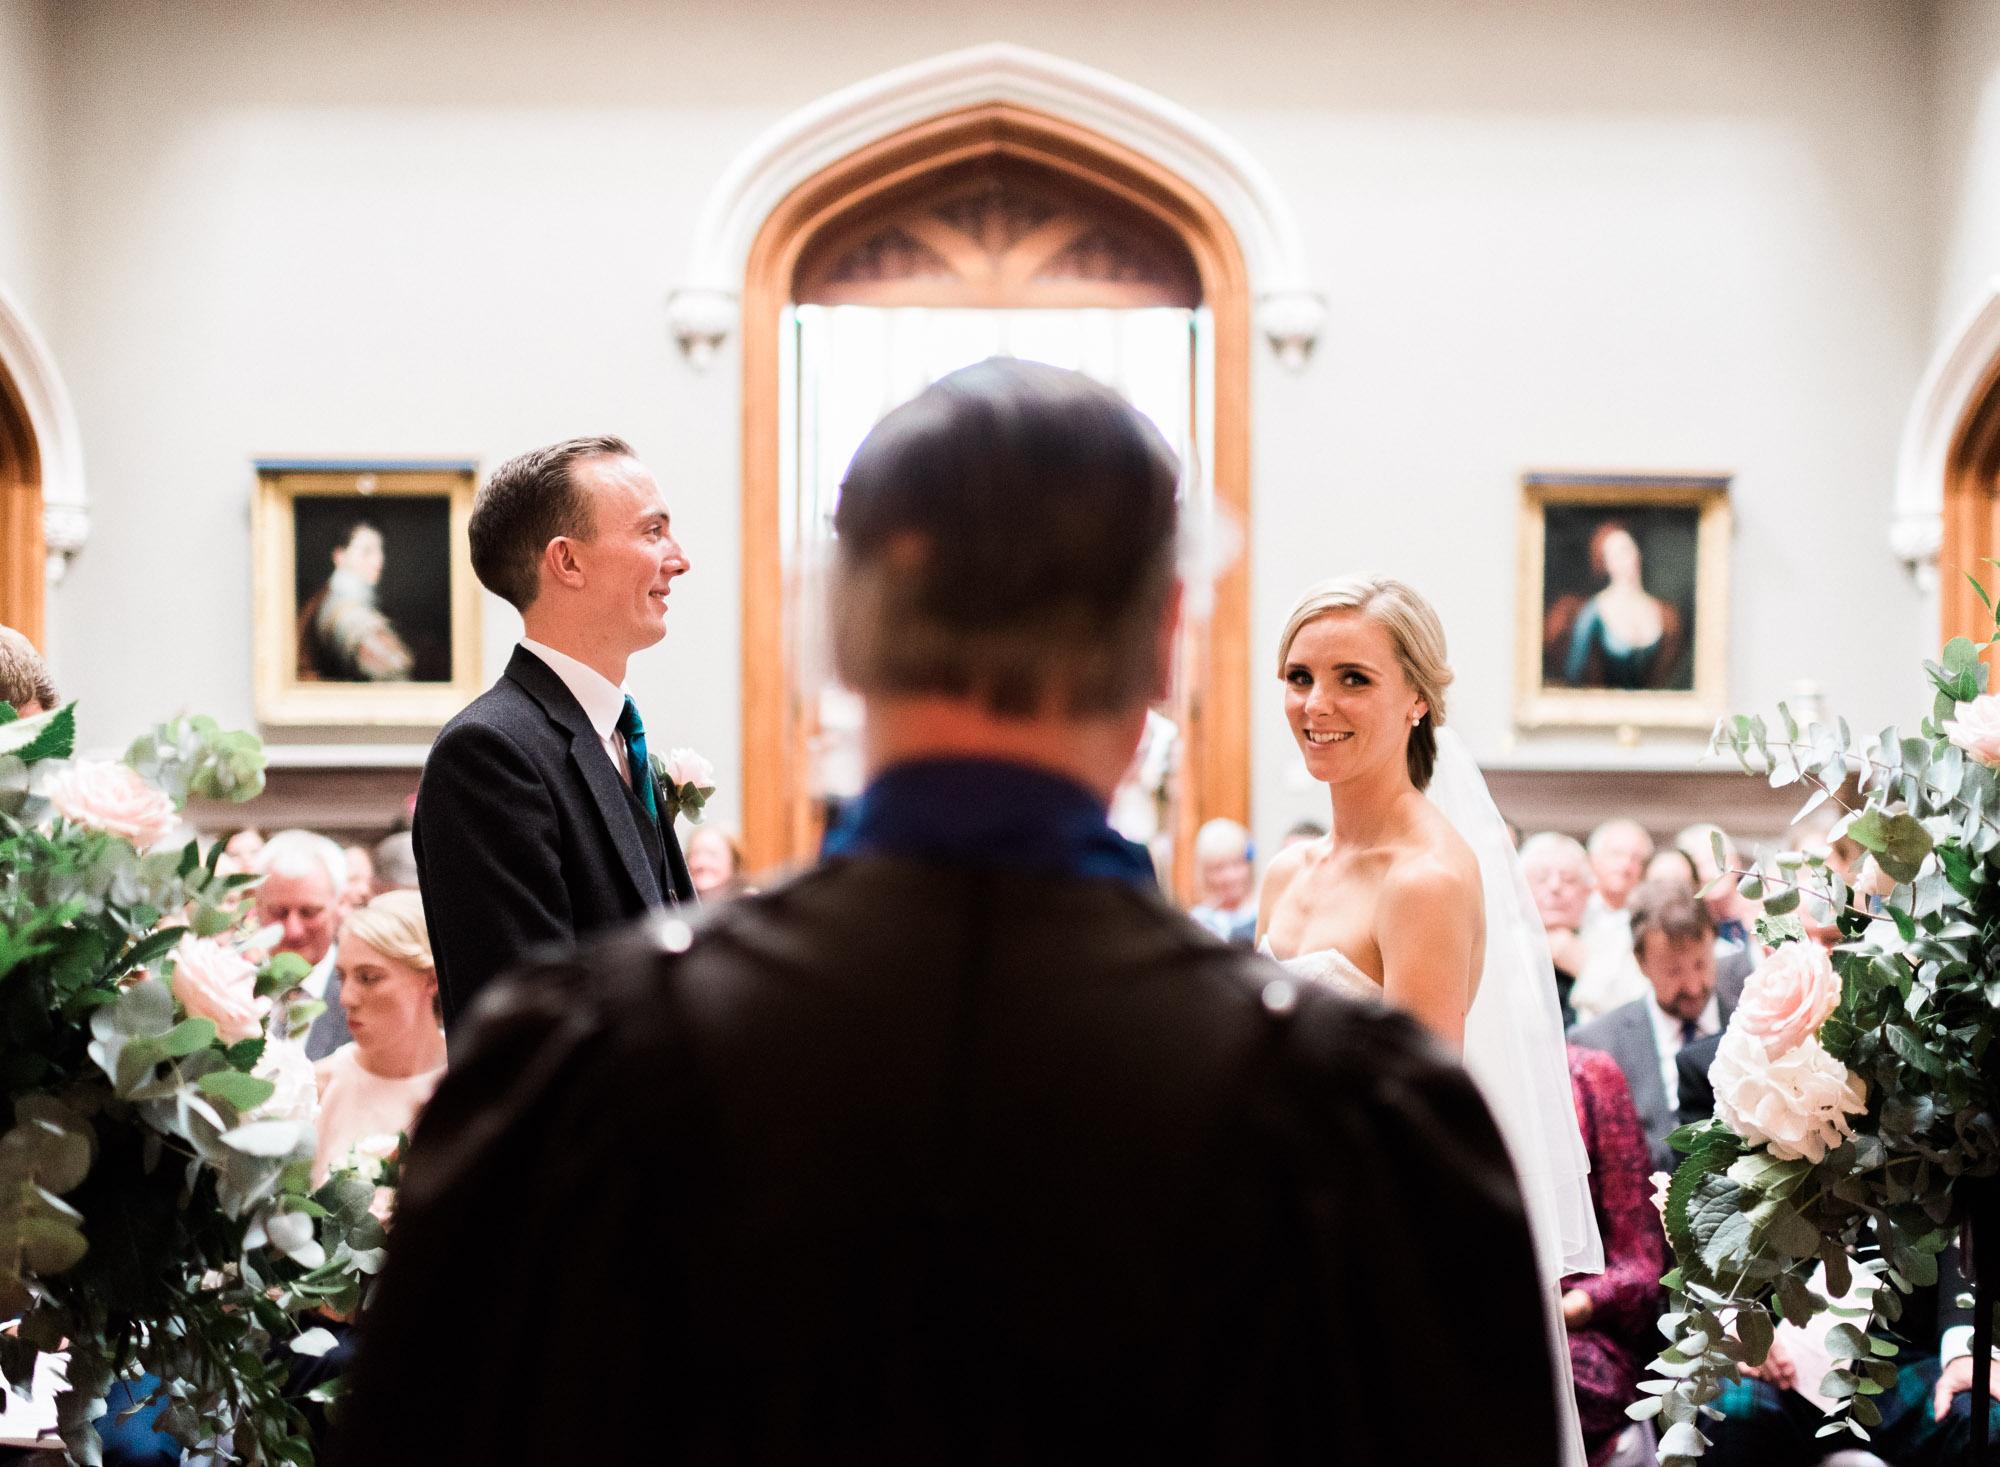 scottish_wedding_blairquhan_castle-68.jpg